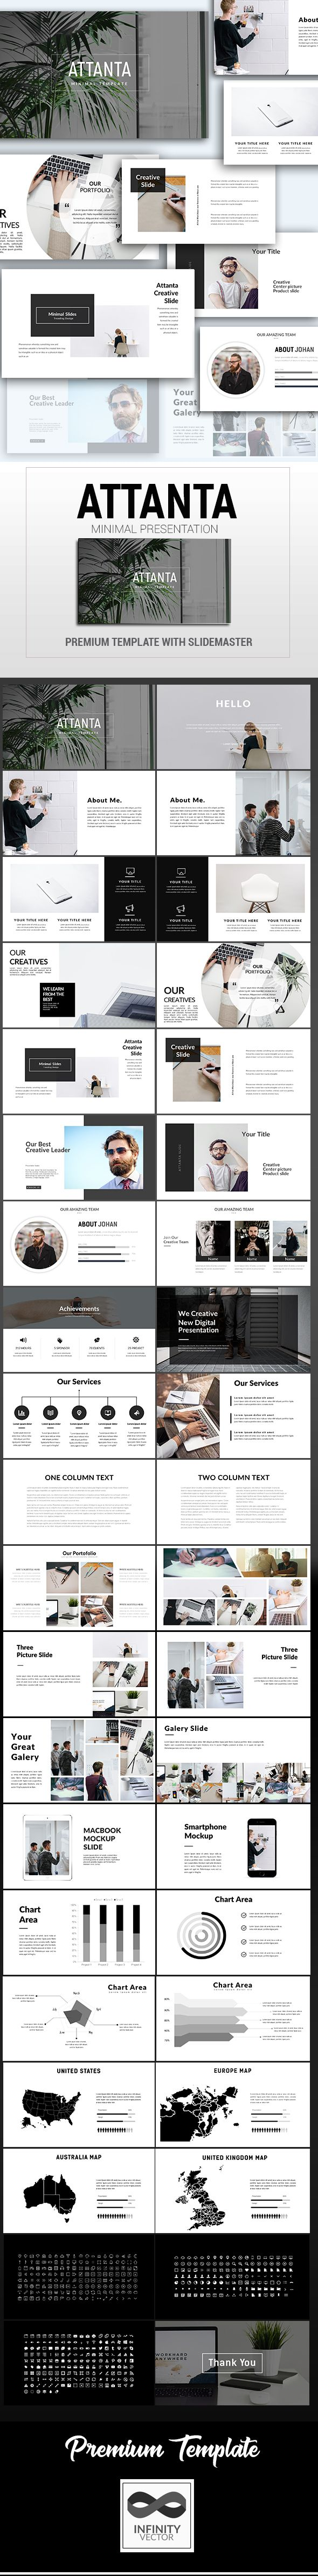 Best 25+ Resume fonts ideas on Pinterest | Resume ideas, Resume ...